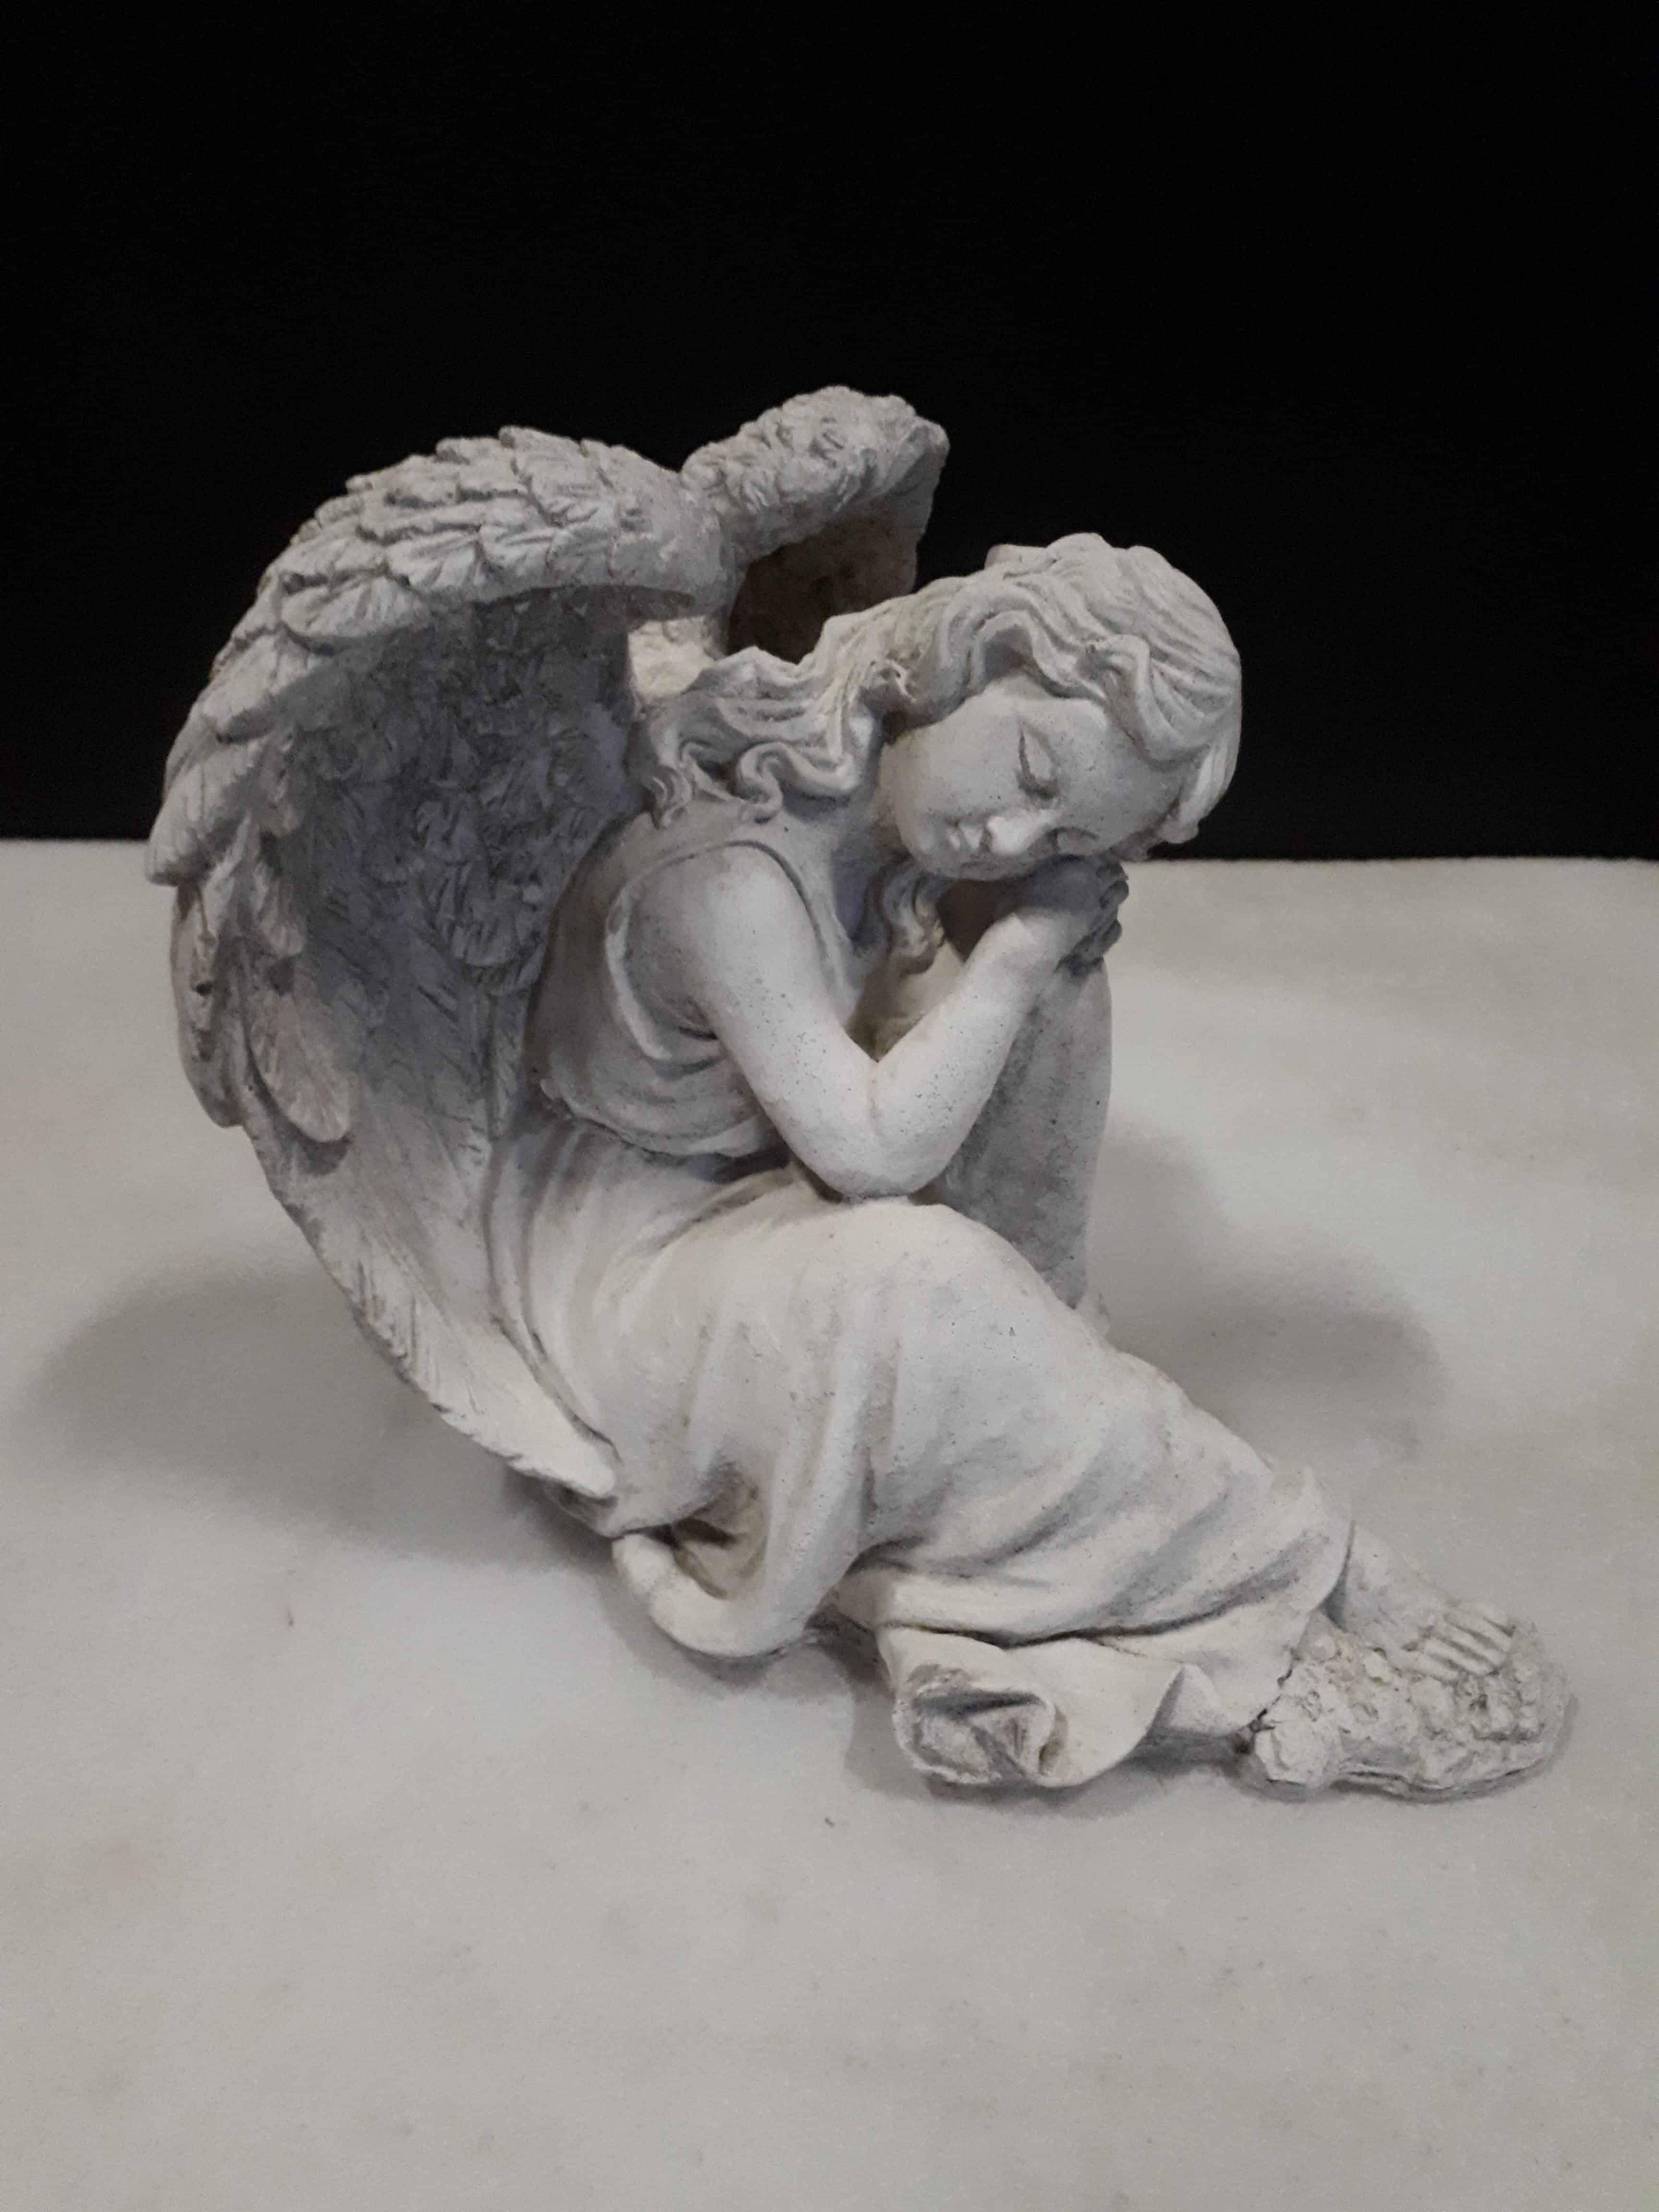 L201 engel elegance 25 cm hoog